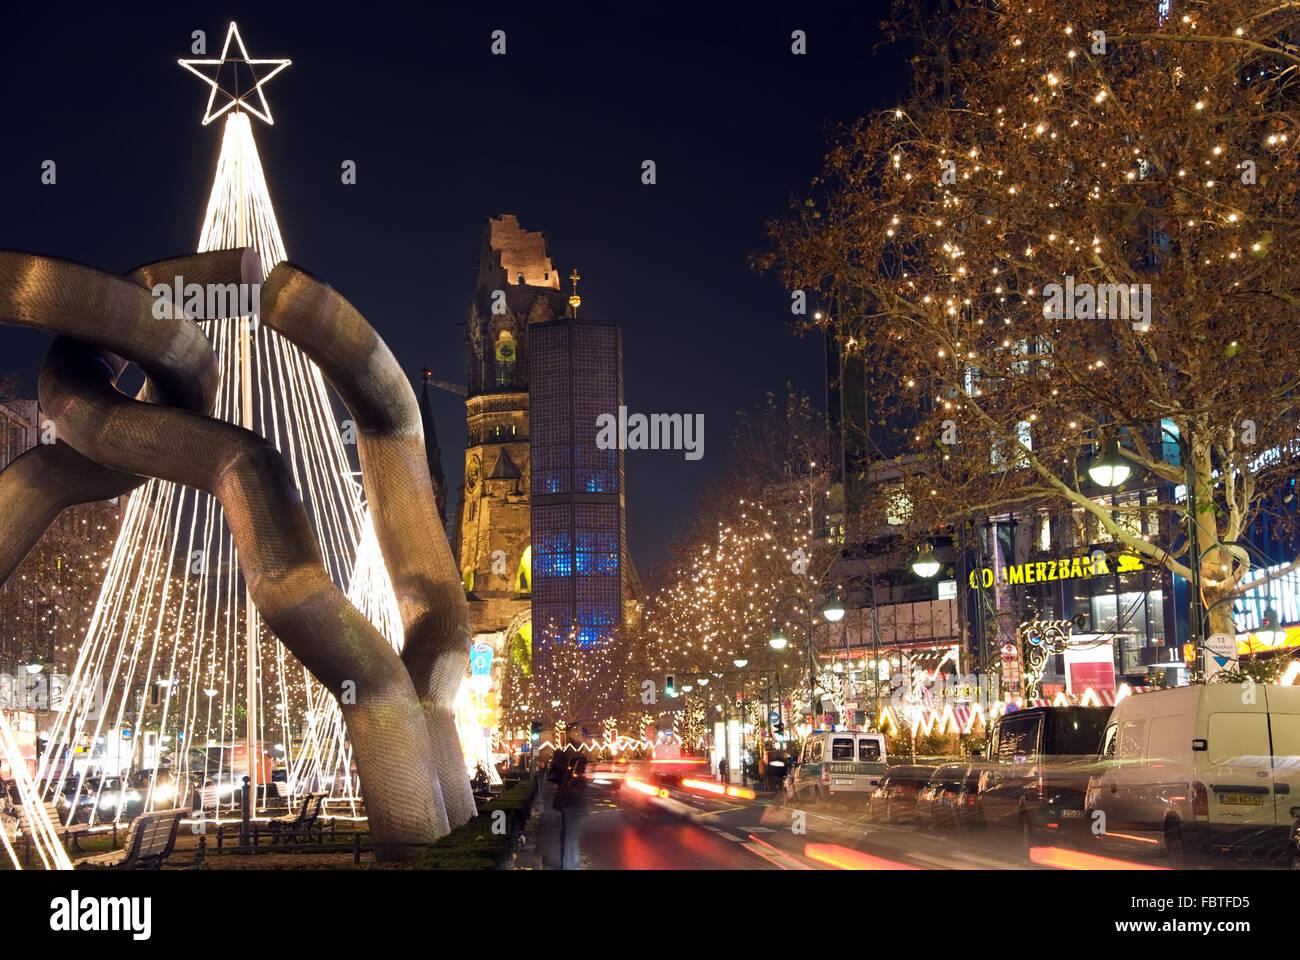 berlin christmastime - Stock Image